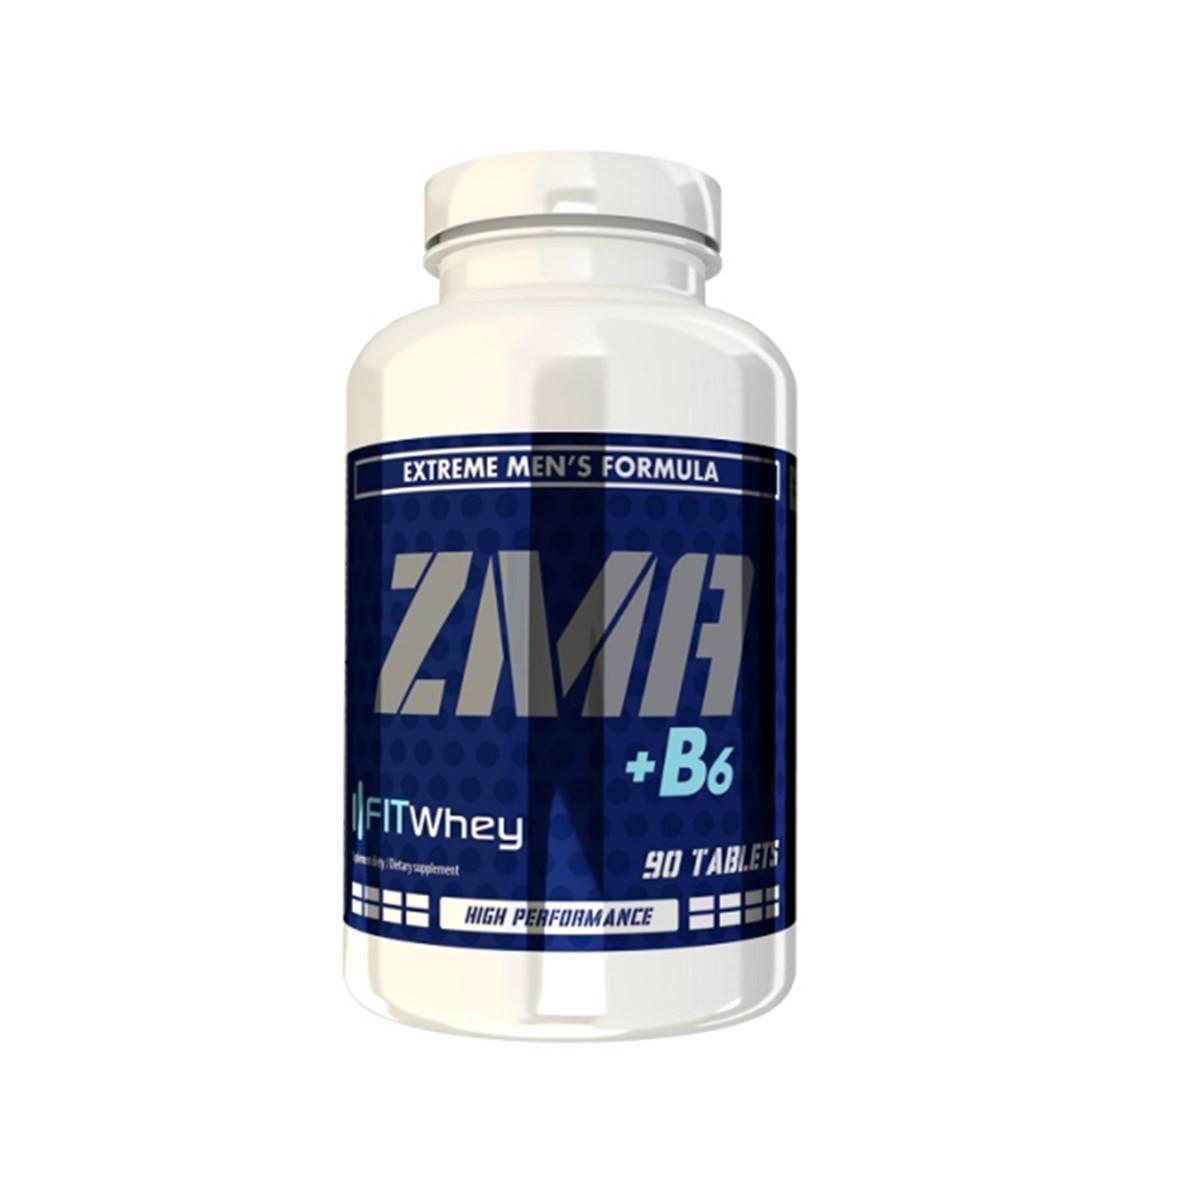 FITWhey Zma+b6 90tabs (Цинк, магнезий и витамин Б6)